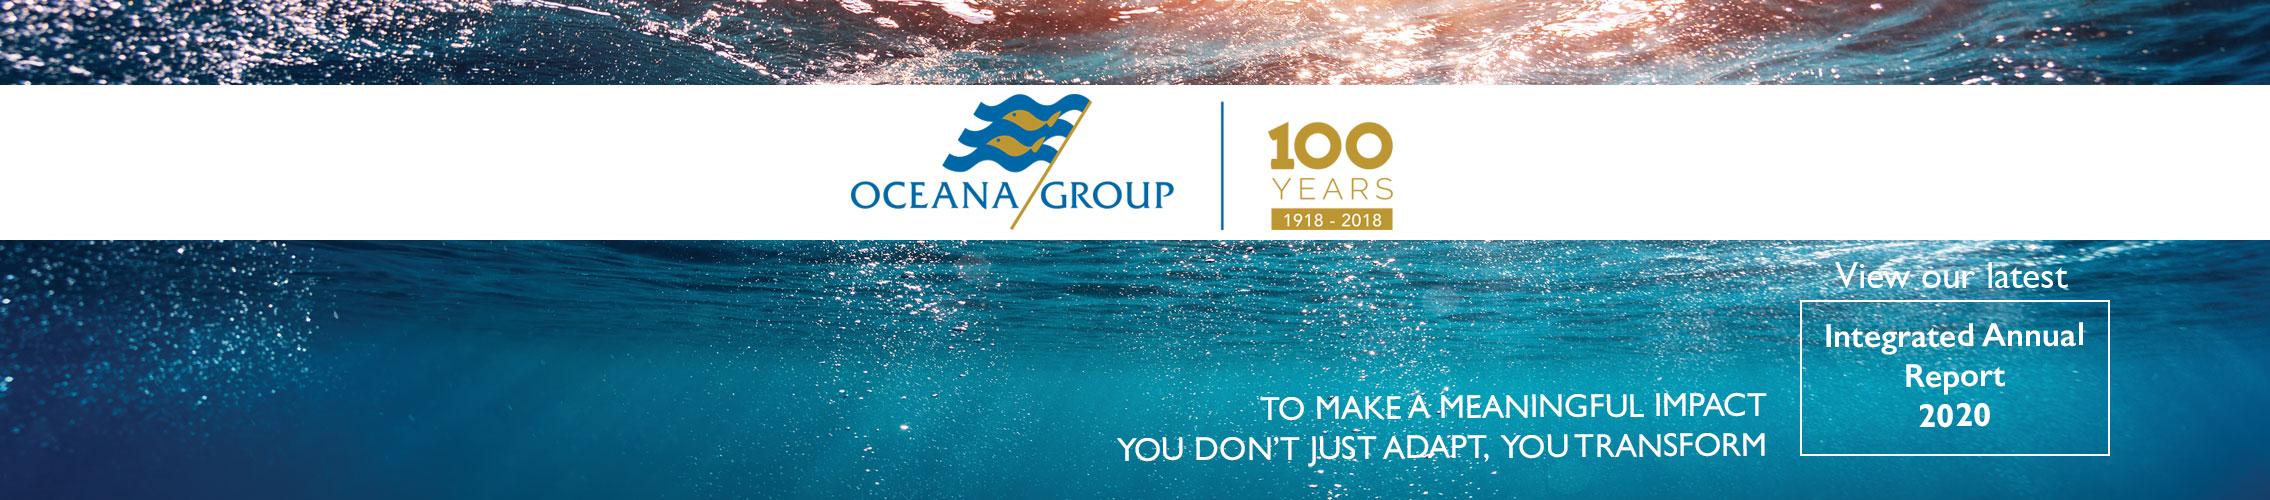 Oceana IAR 2020 banner